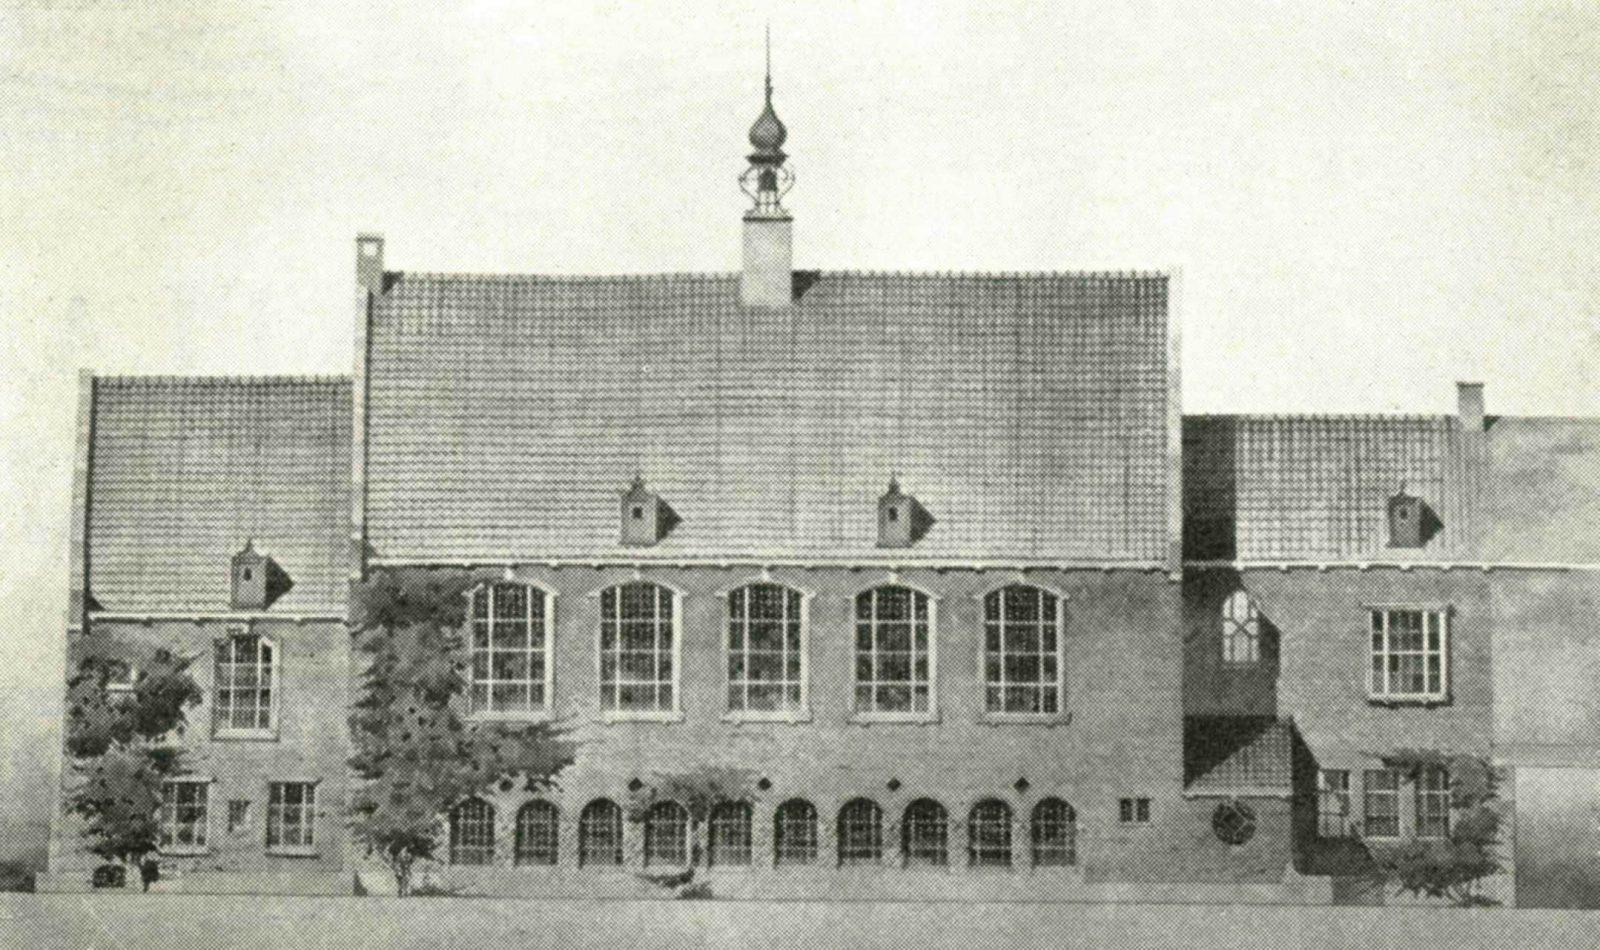 Schotse-kerk-Maasstad-1950-p.99